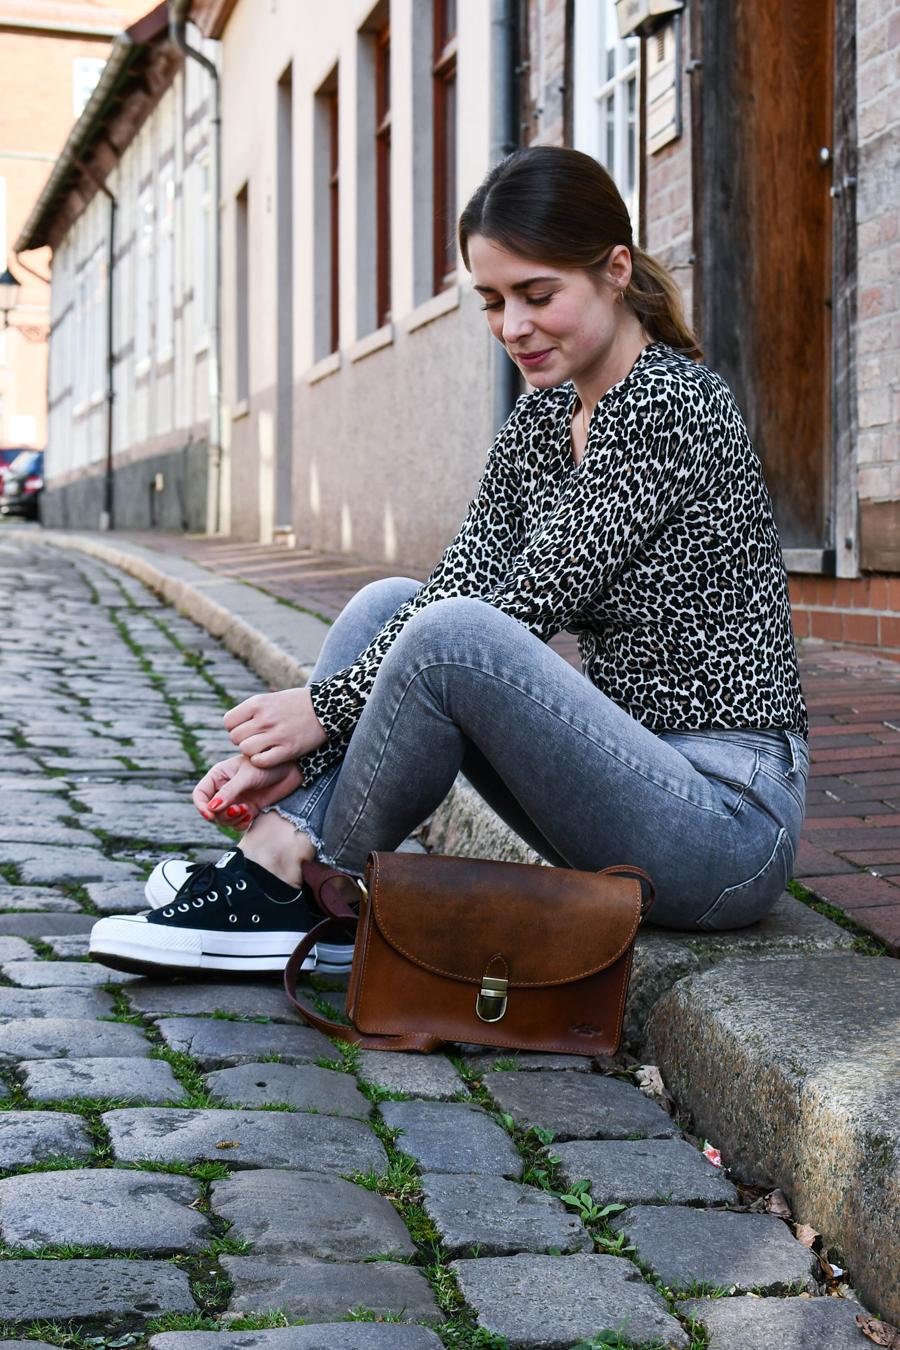 Alltagsoutfit: Jeans, Leo-Jacke und Plateau Sneakers